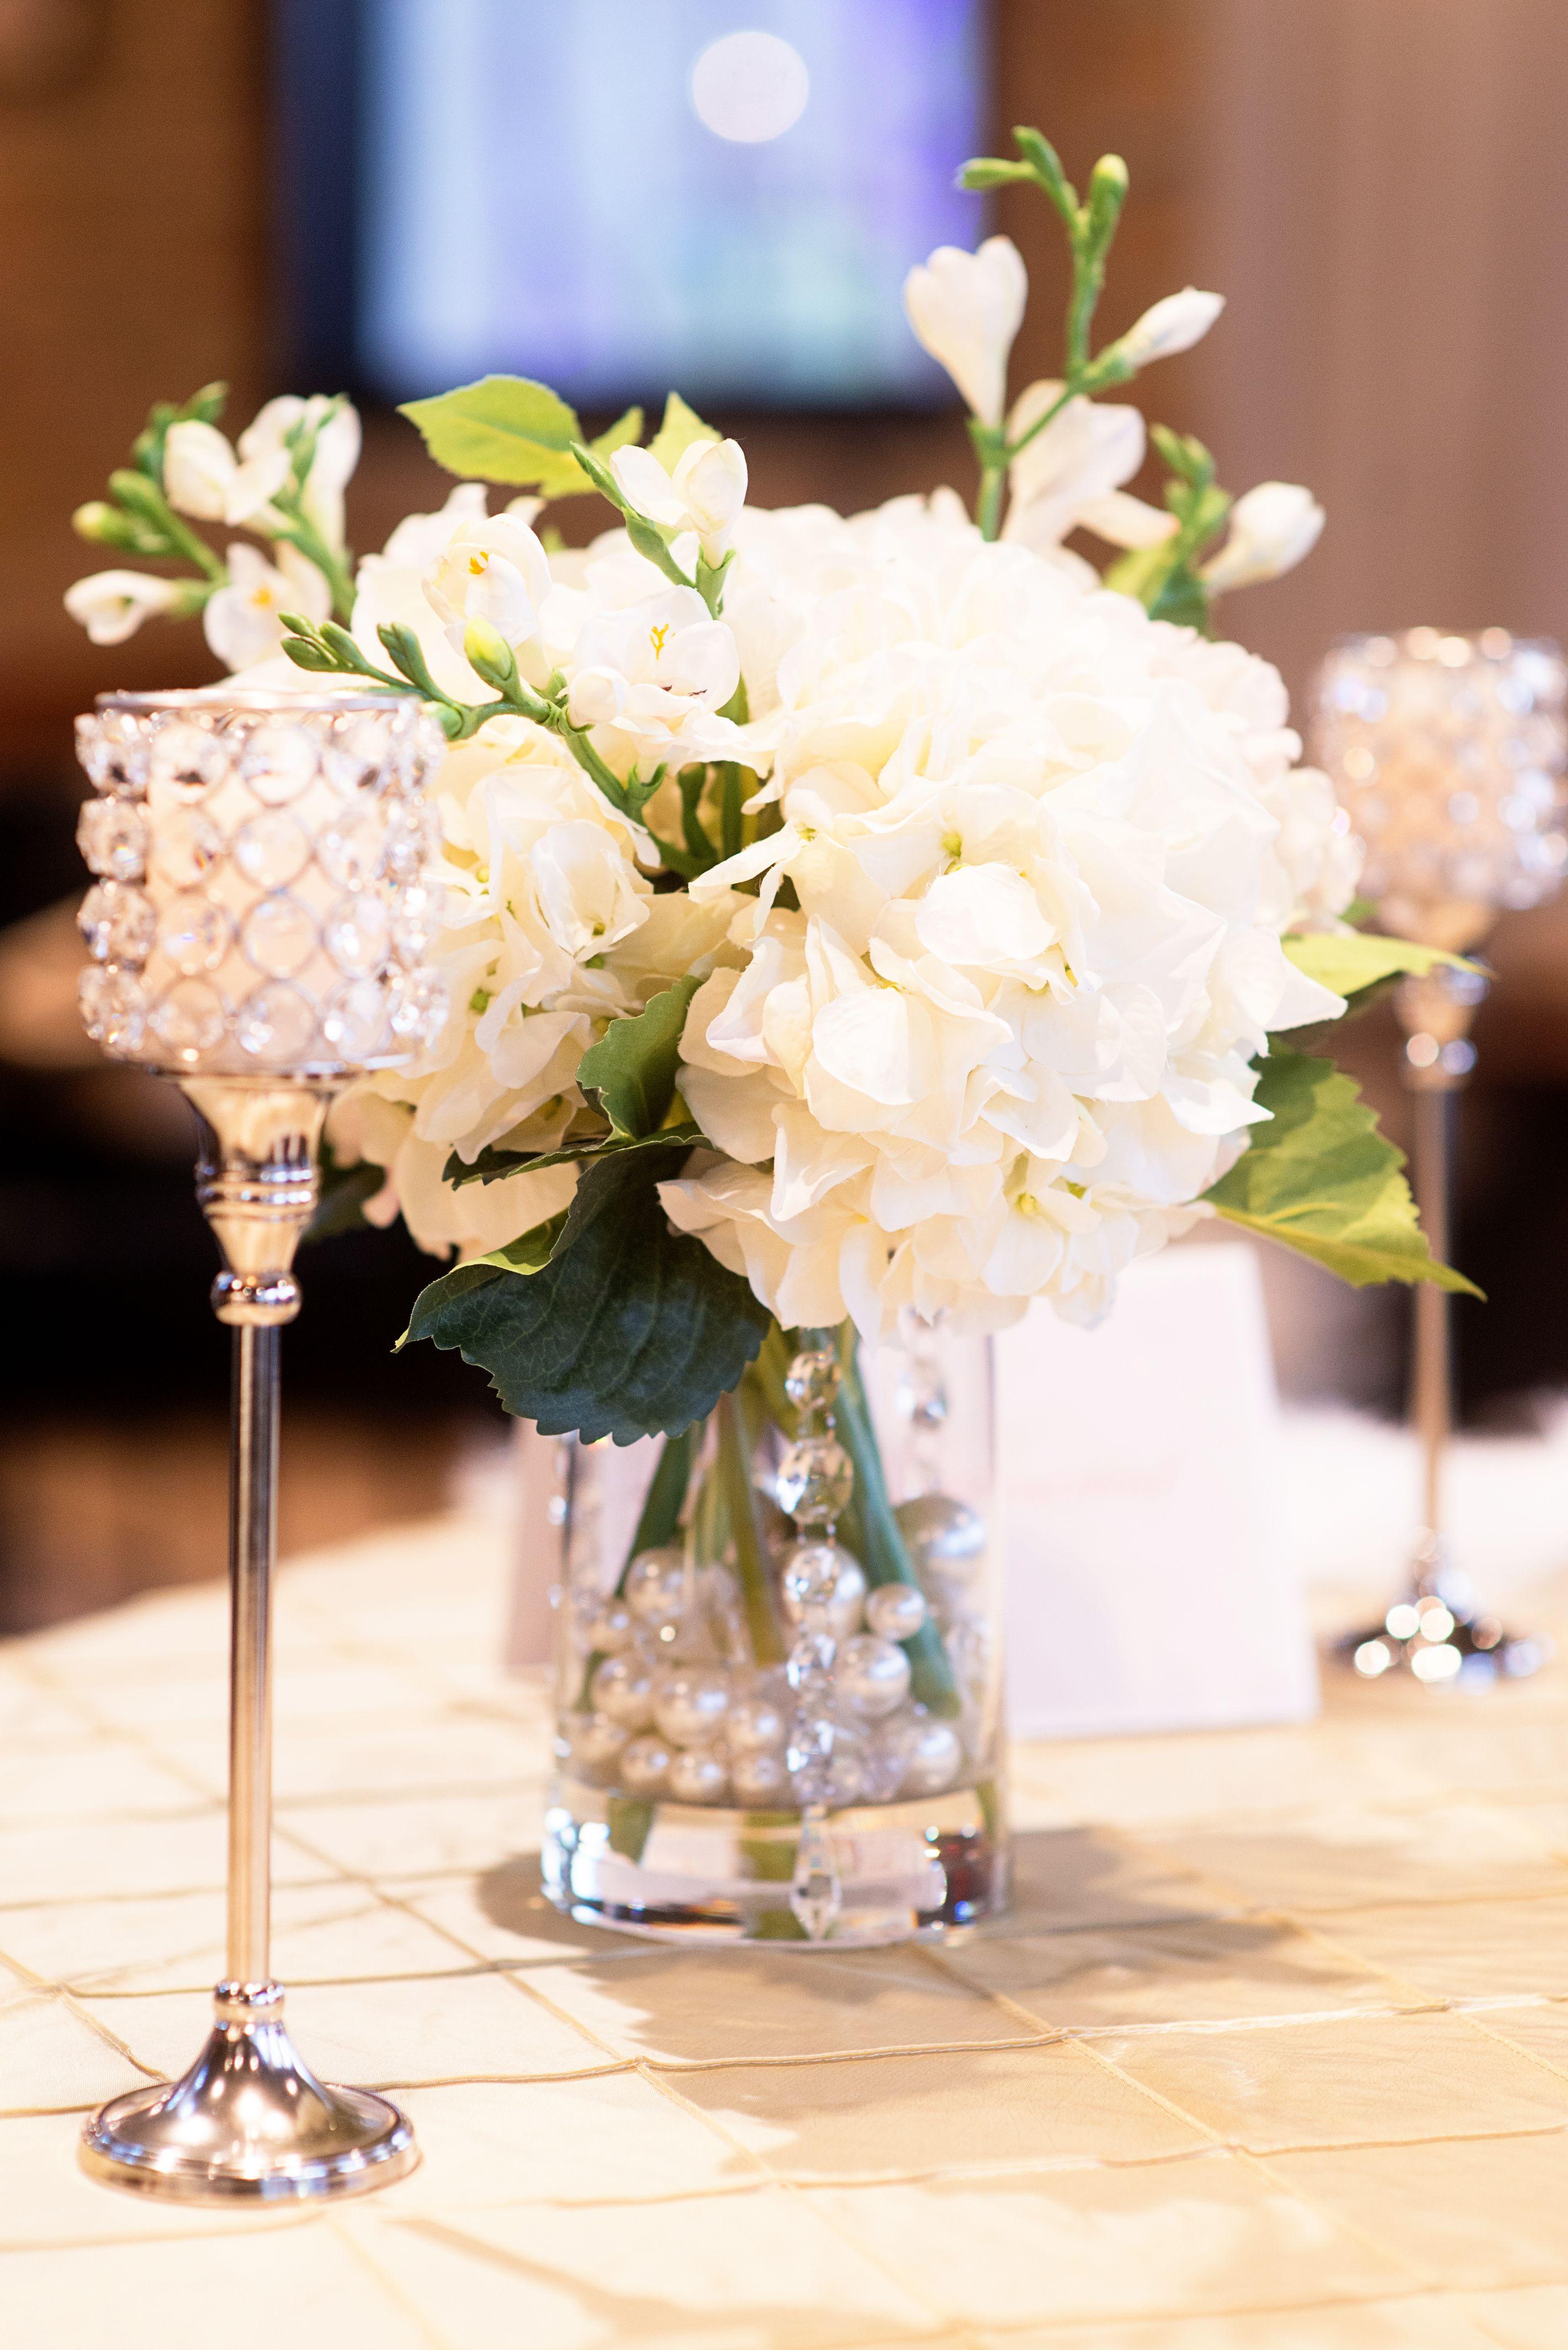 White Hydrangea Centerpiece With Candles Wedding Flowers